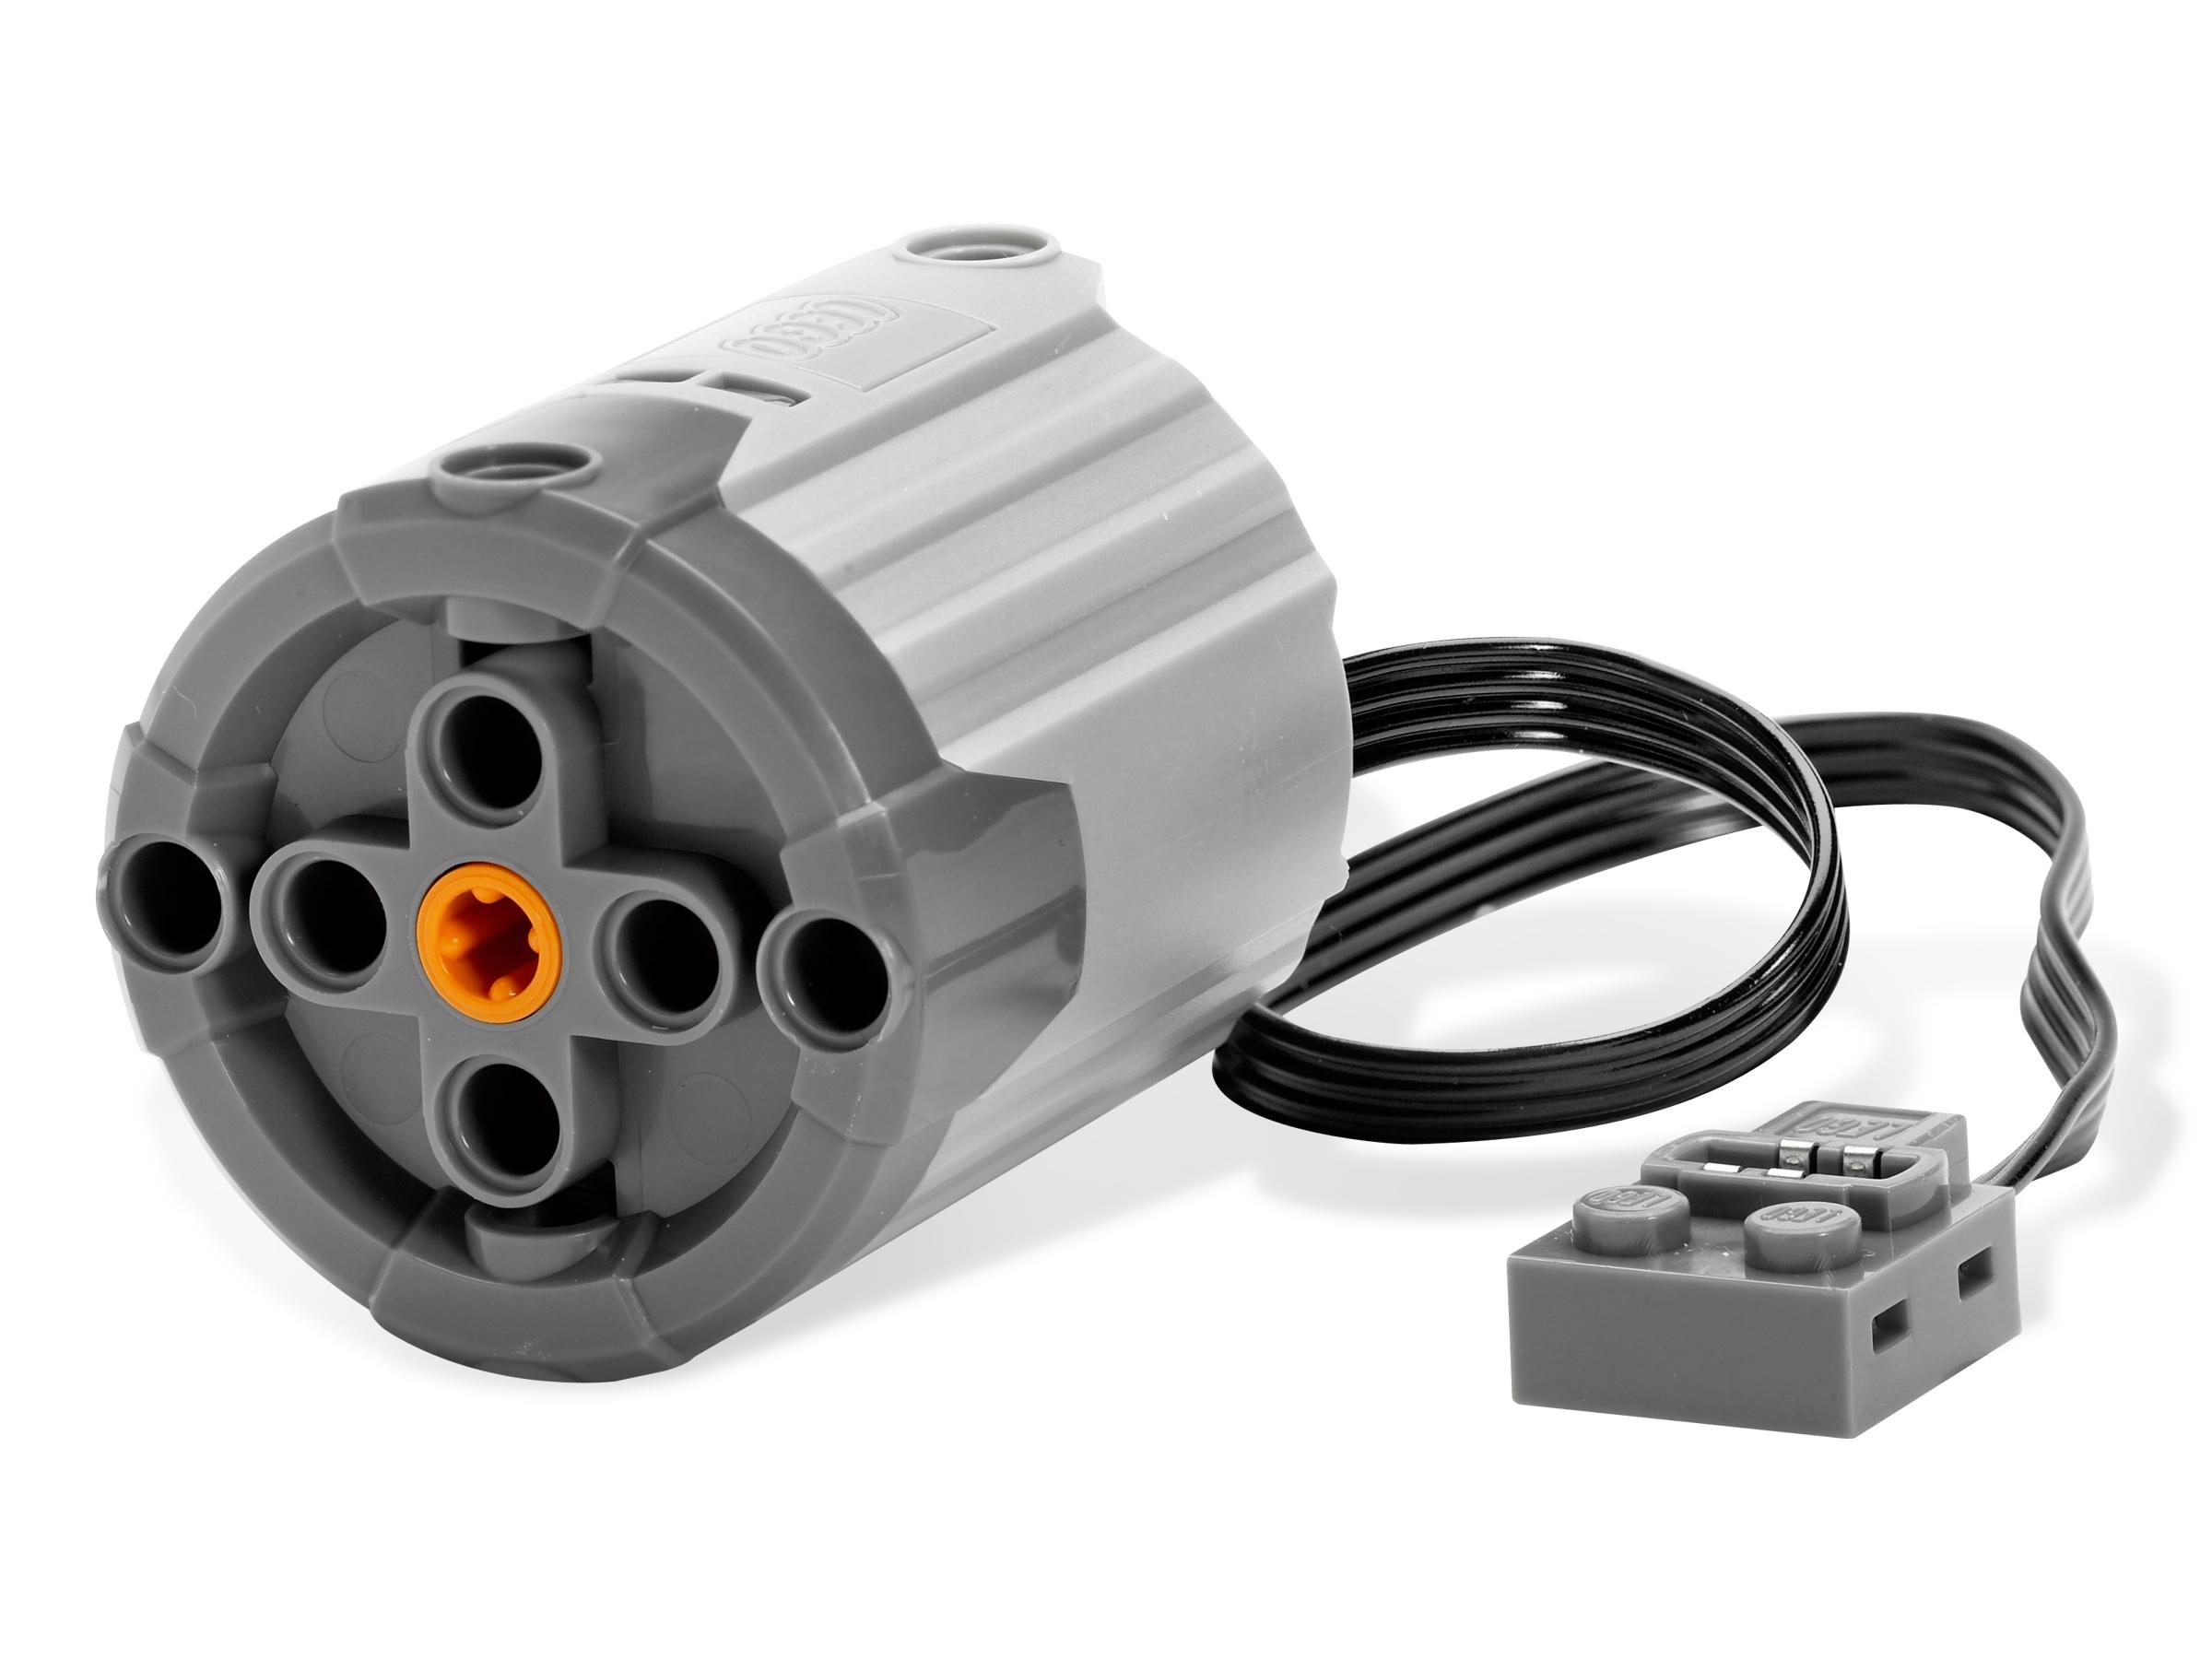 lego powerfuncties xl motor 8882